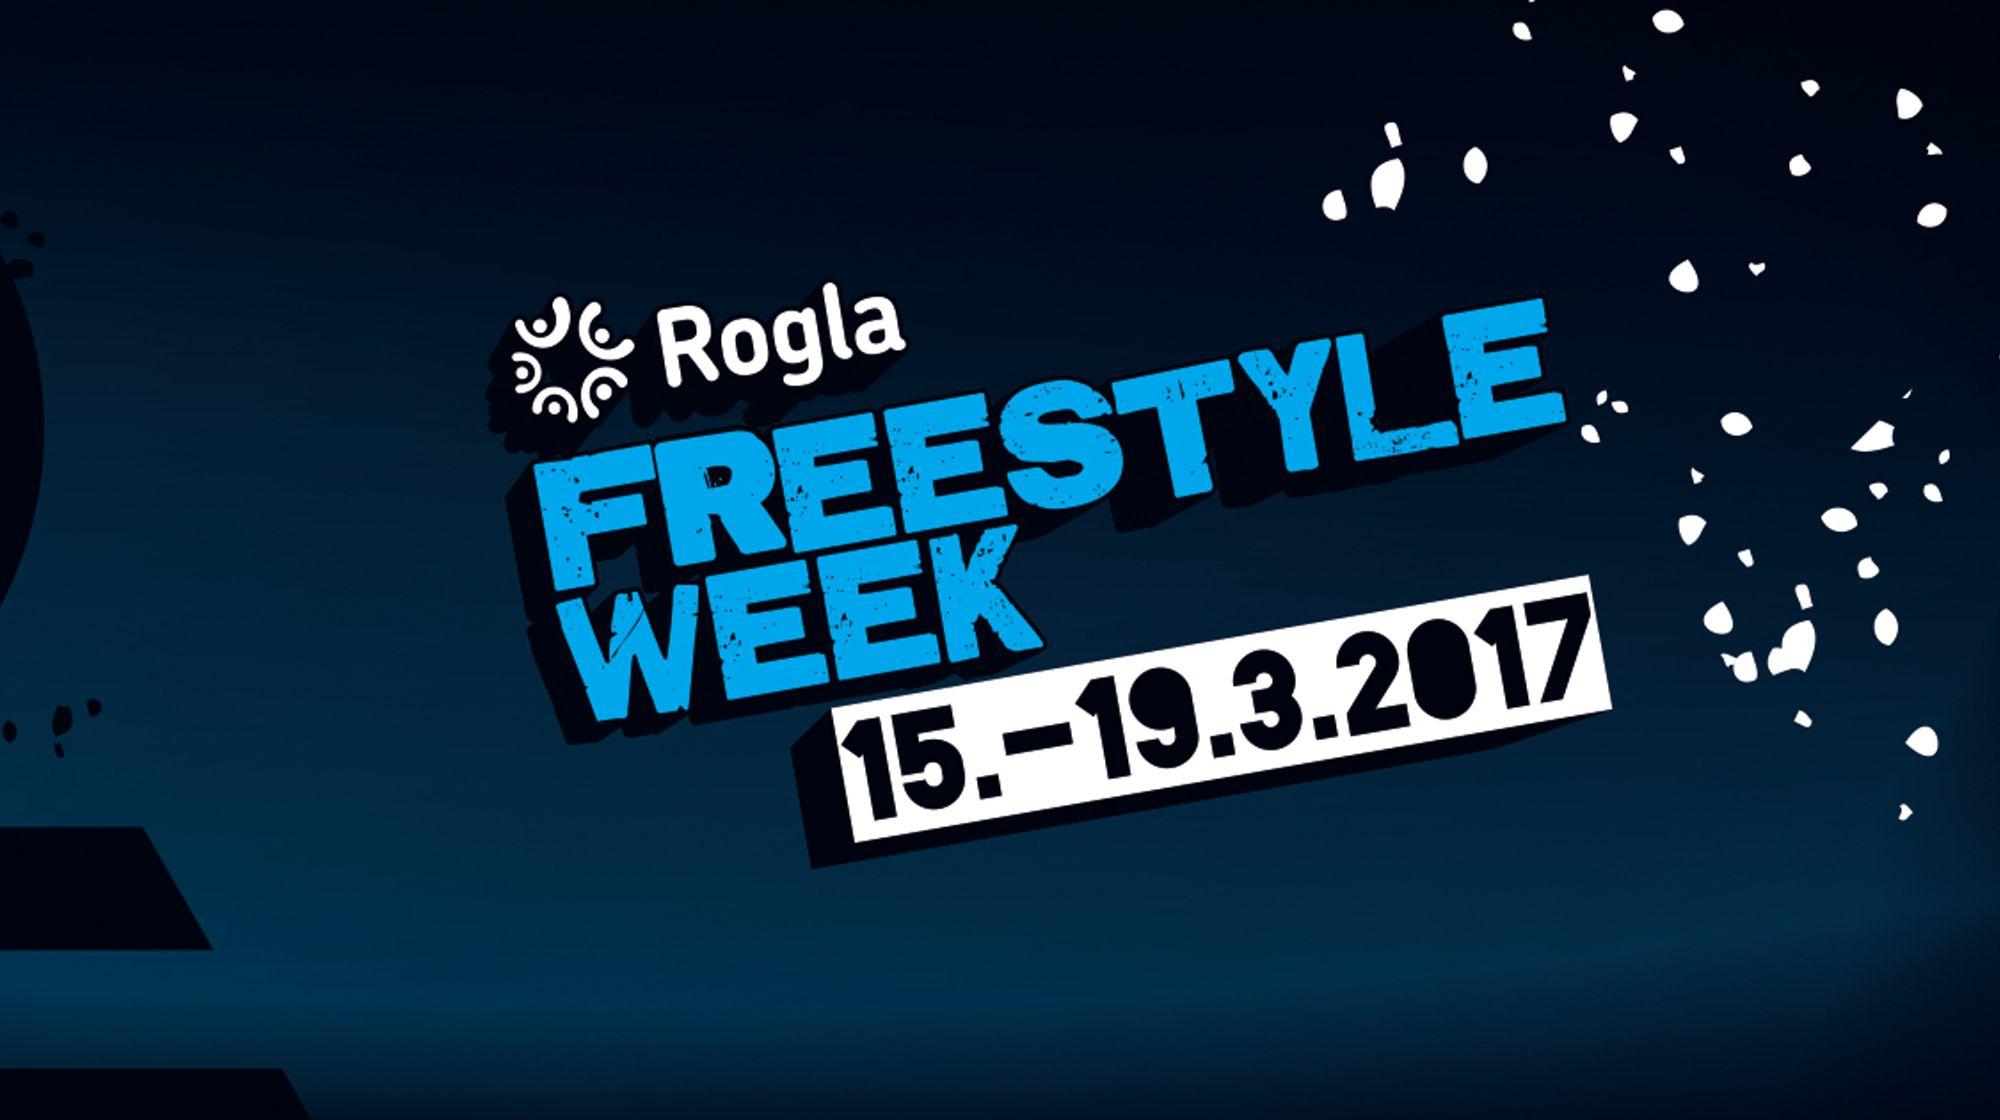 Freestyle Week